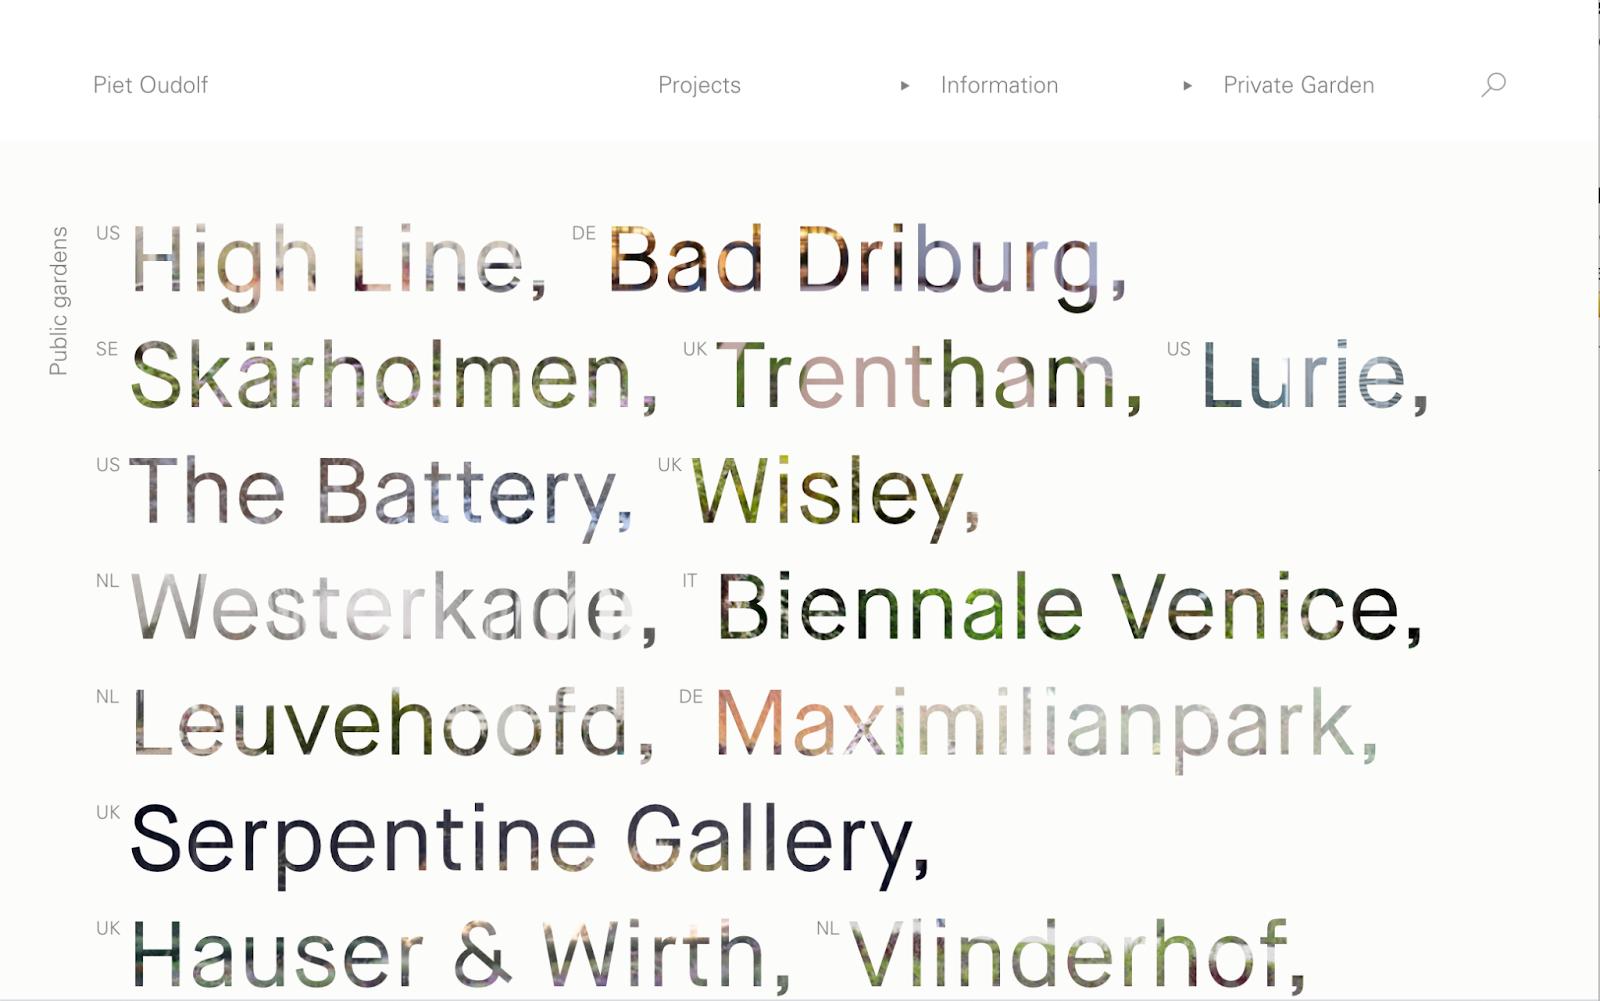 Piet Oudolf, a Dutch perennial garden designer, uses typography in an interesting way on his website – source